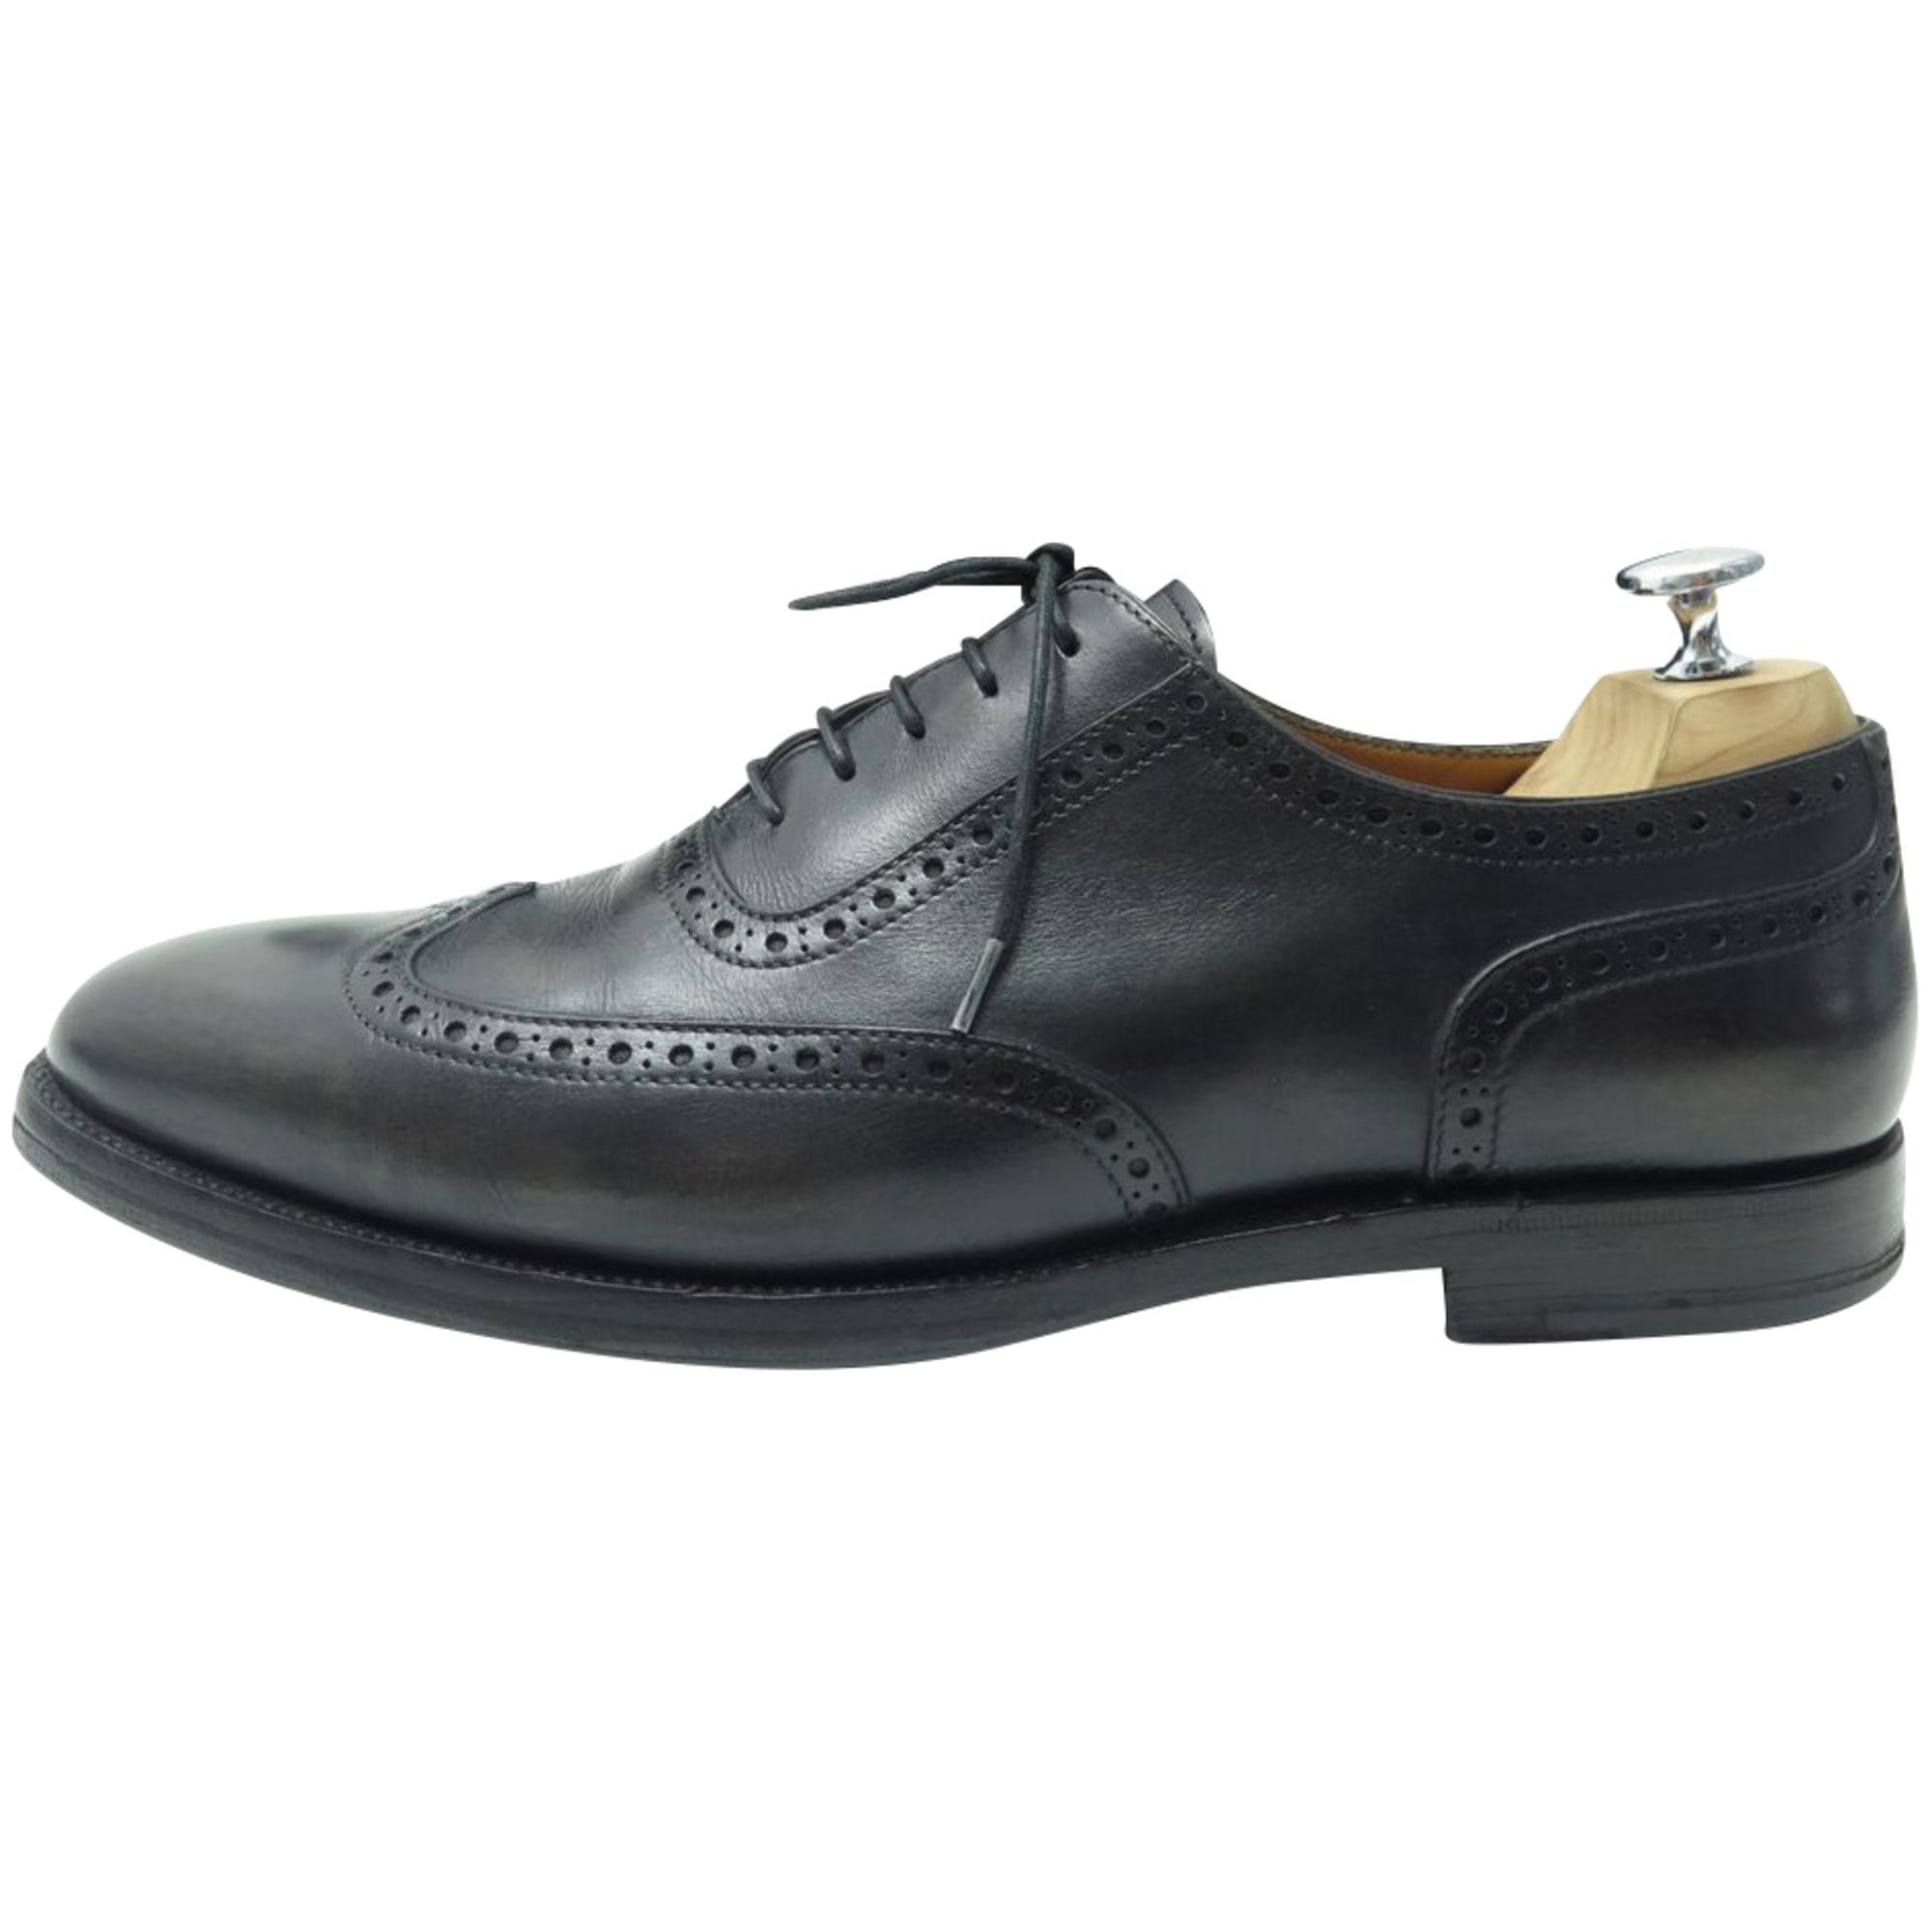 Chaussures à lacets BERLUTI Gris, anthracite